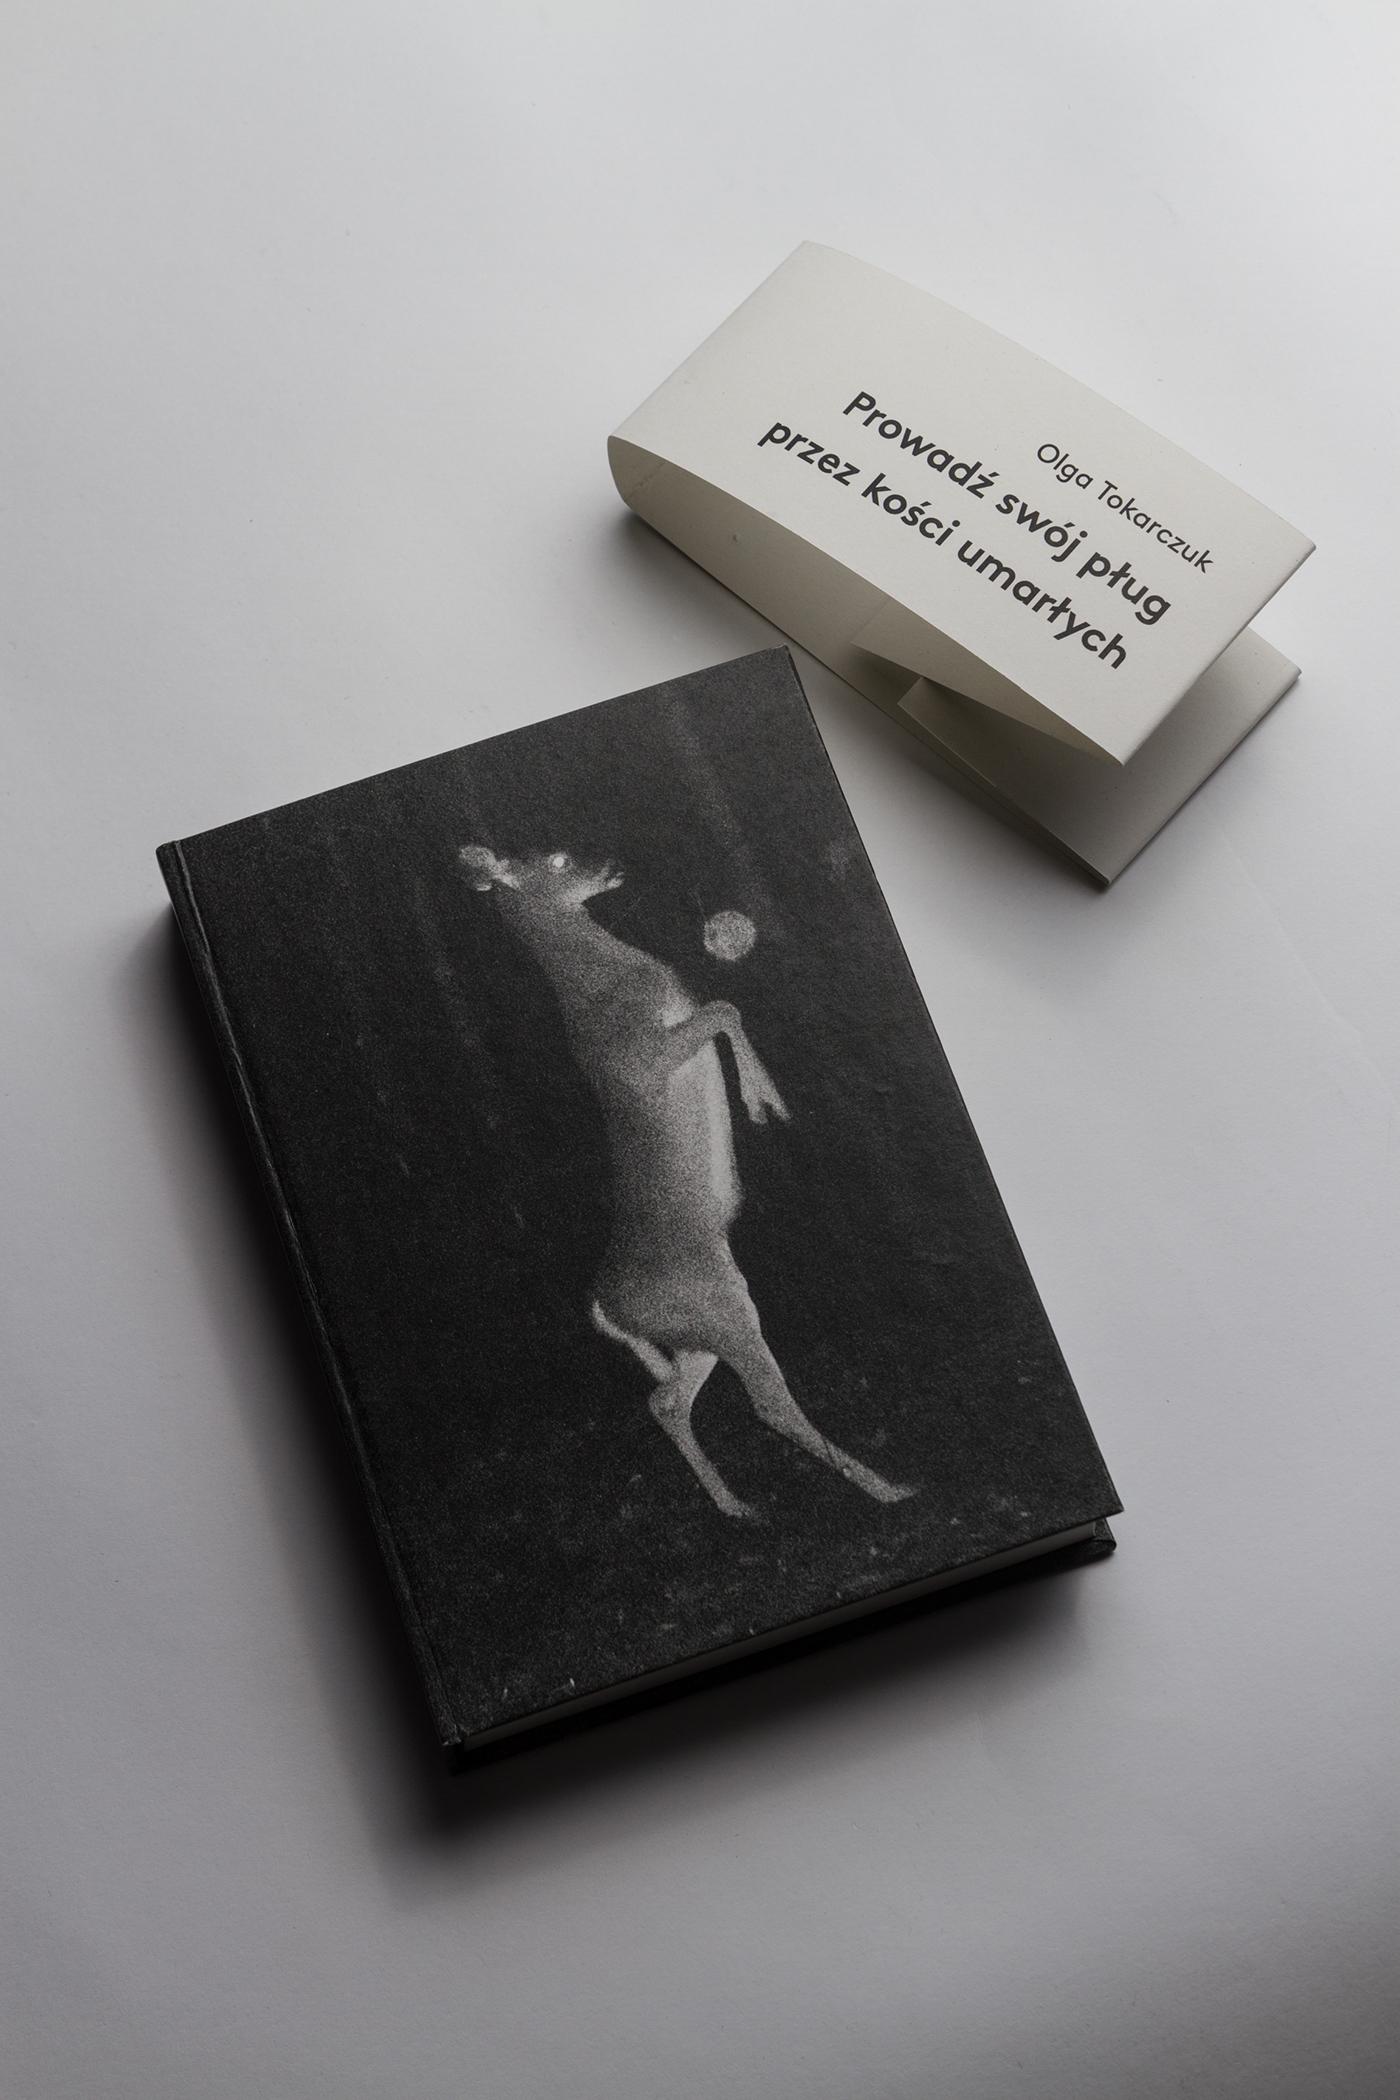 tokarczuk deer editorial publication crime night forest animal Pokot katowice